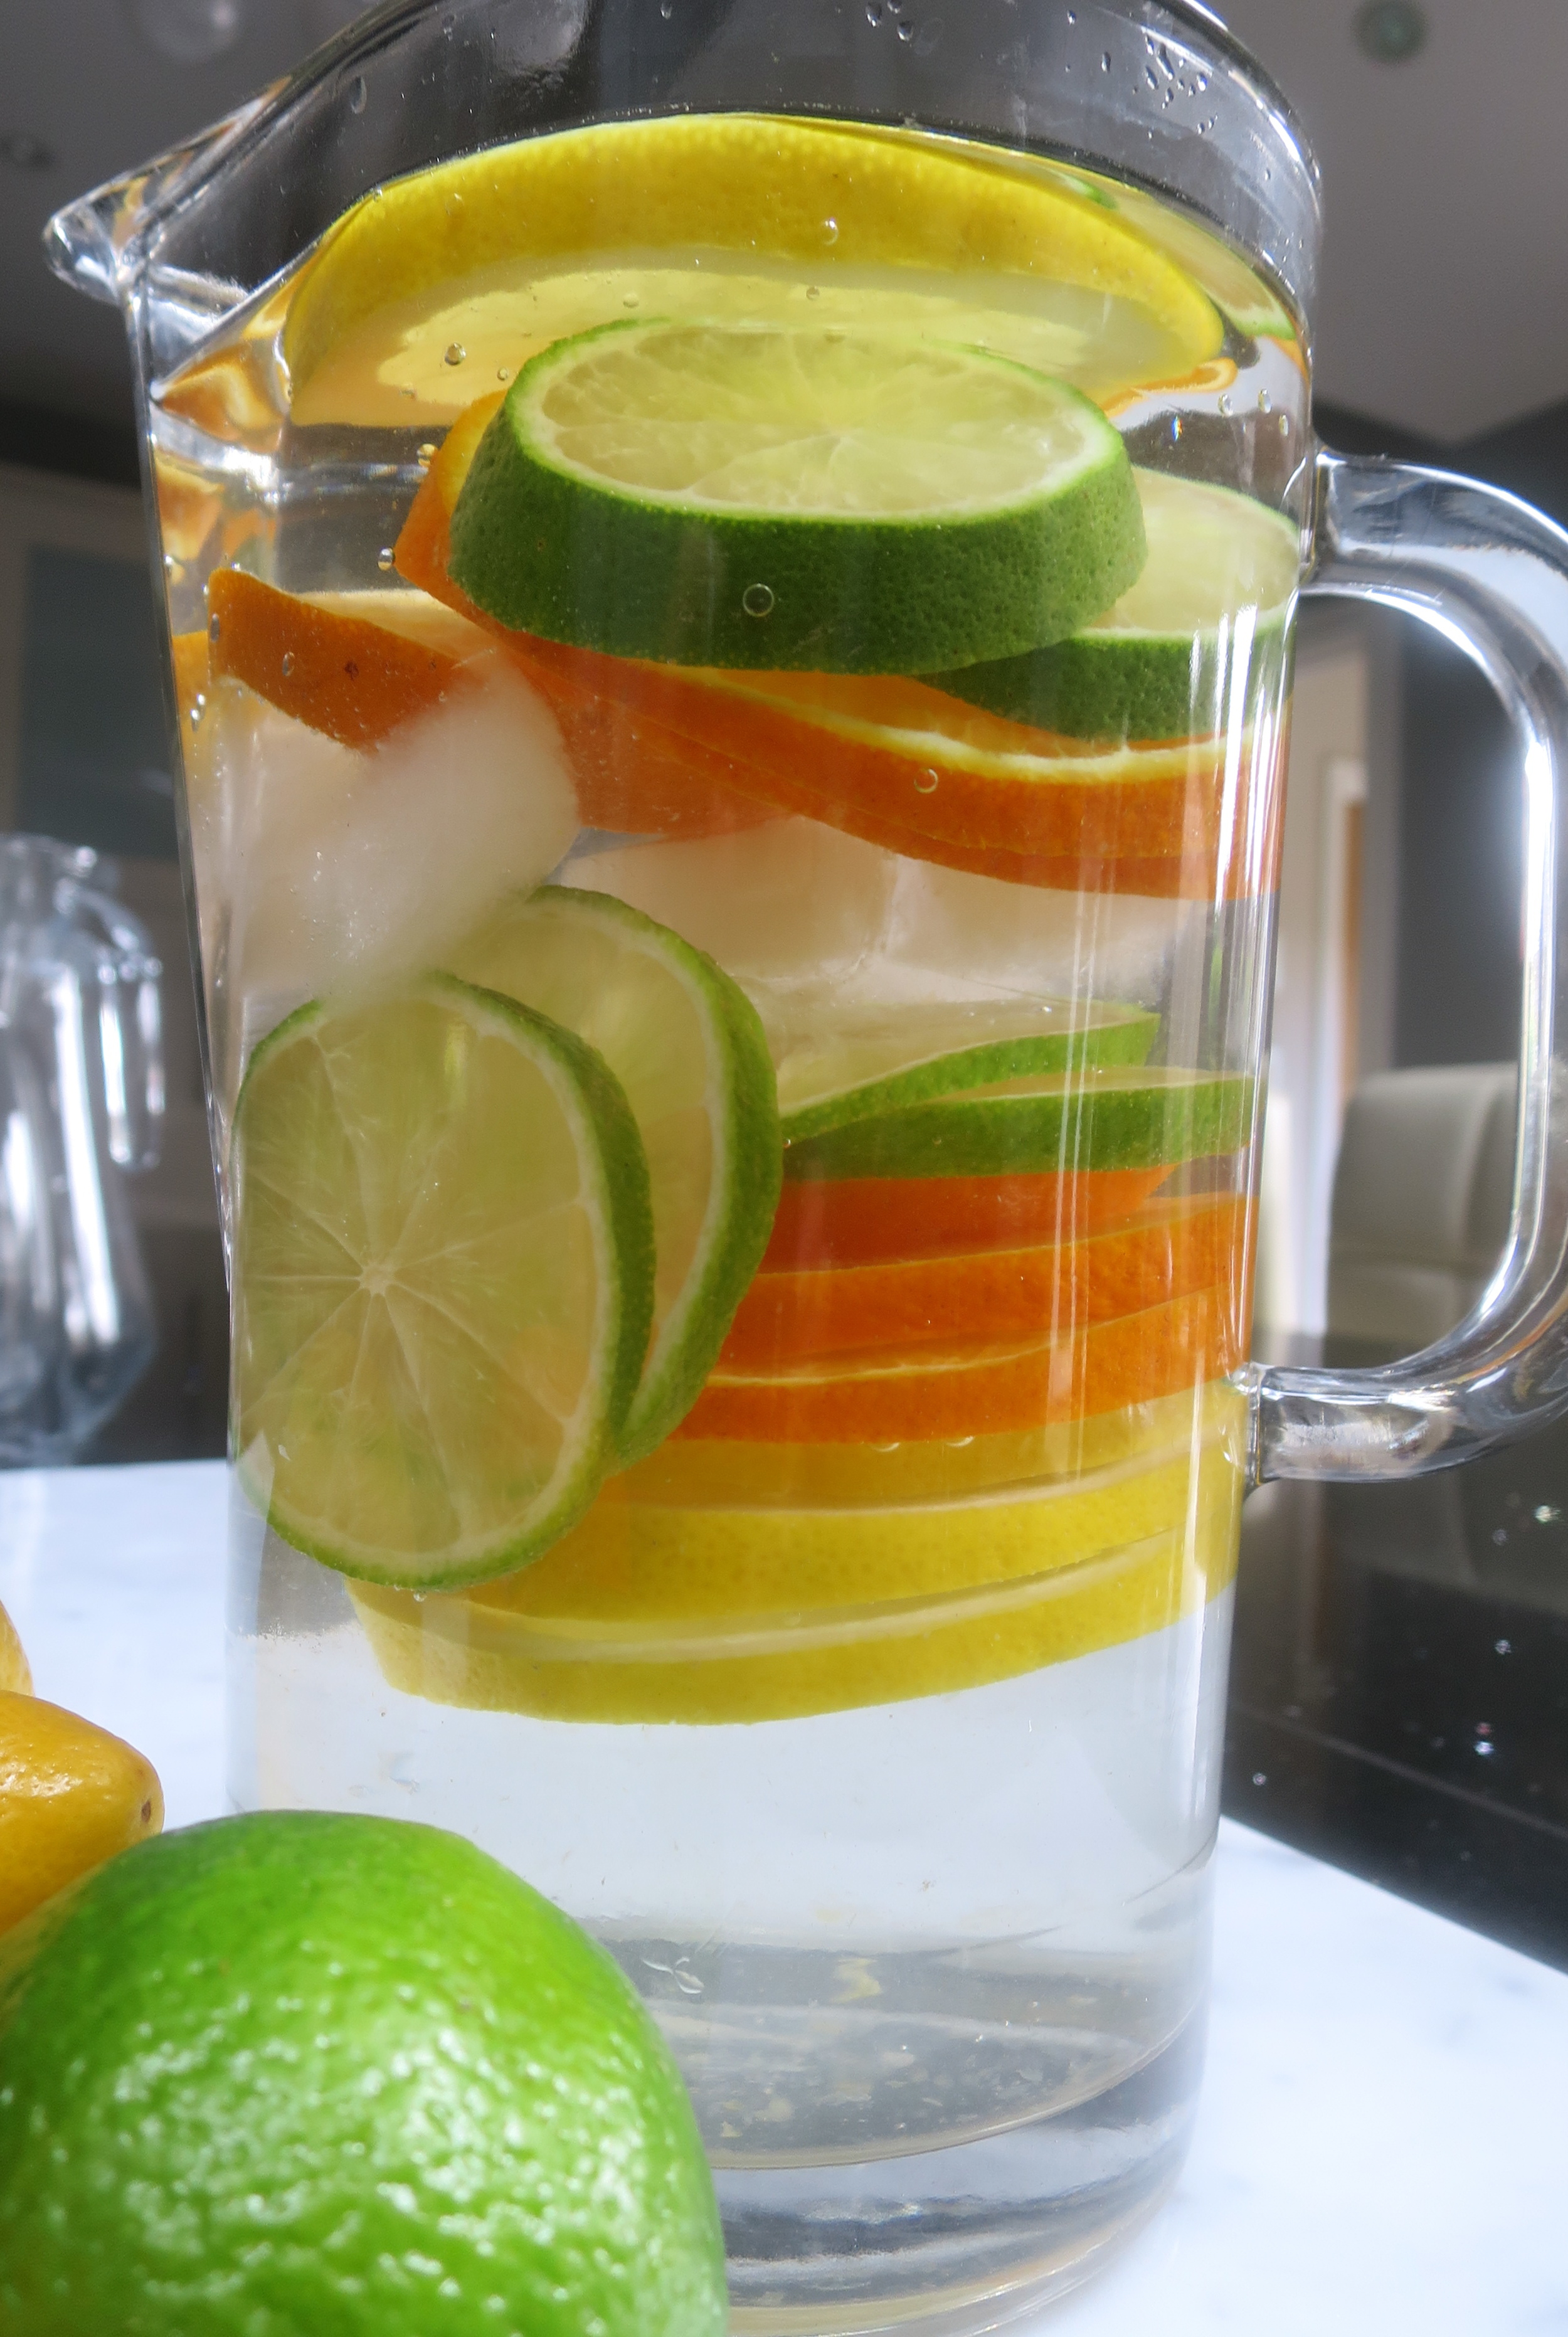 Lemon, Lime and Orange.